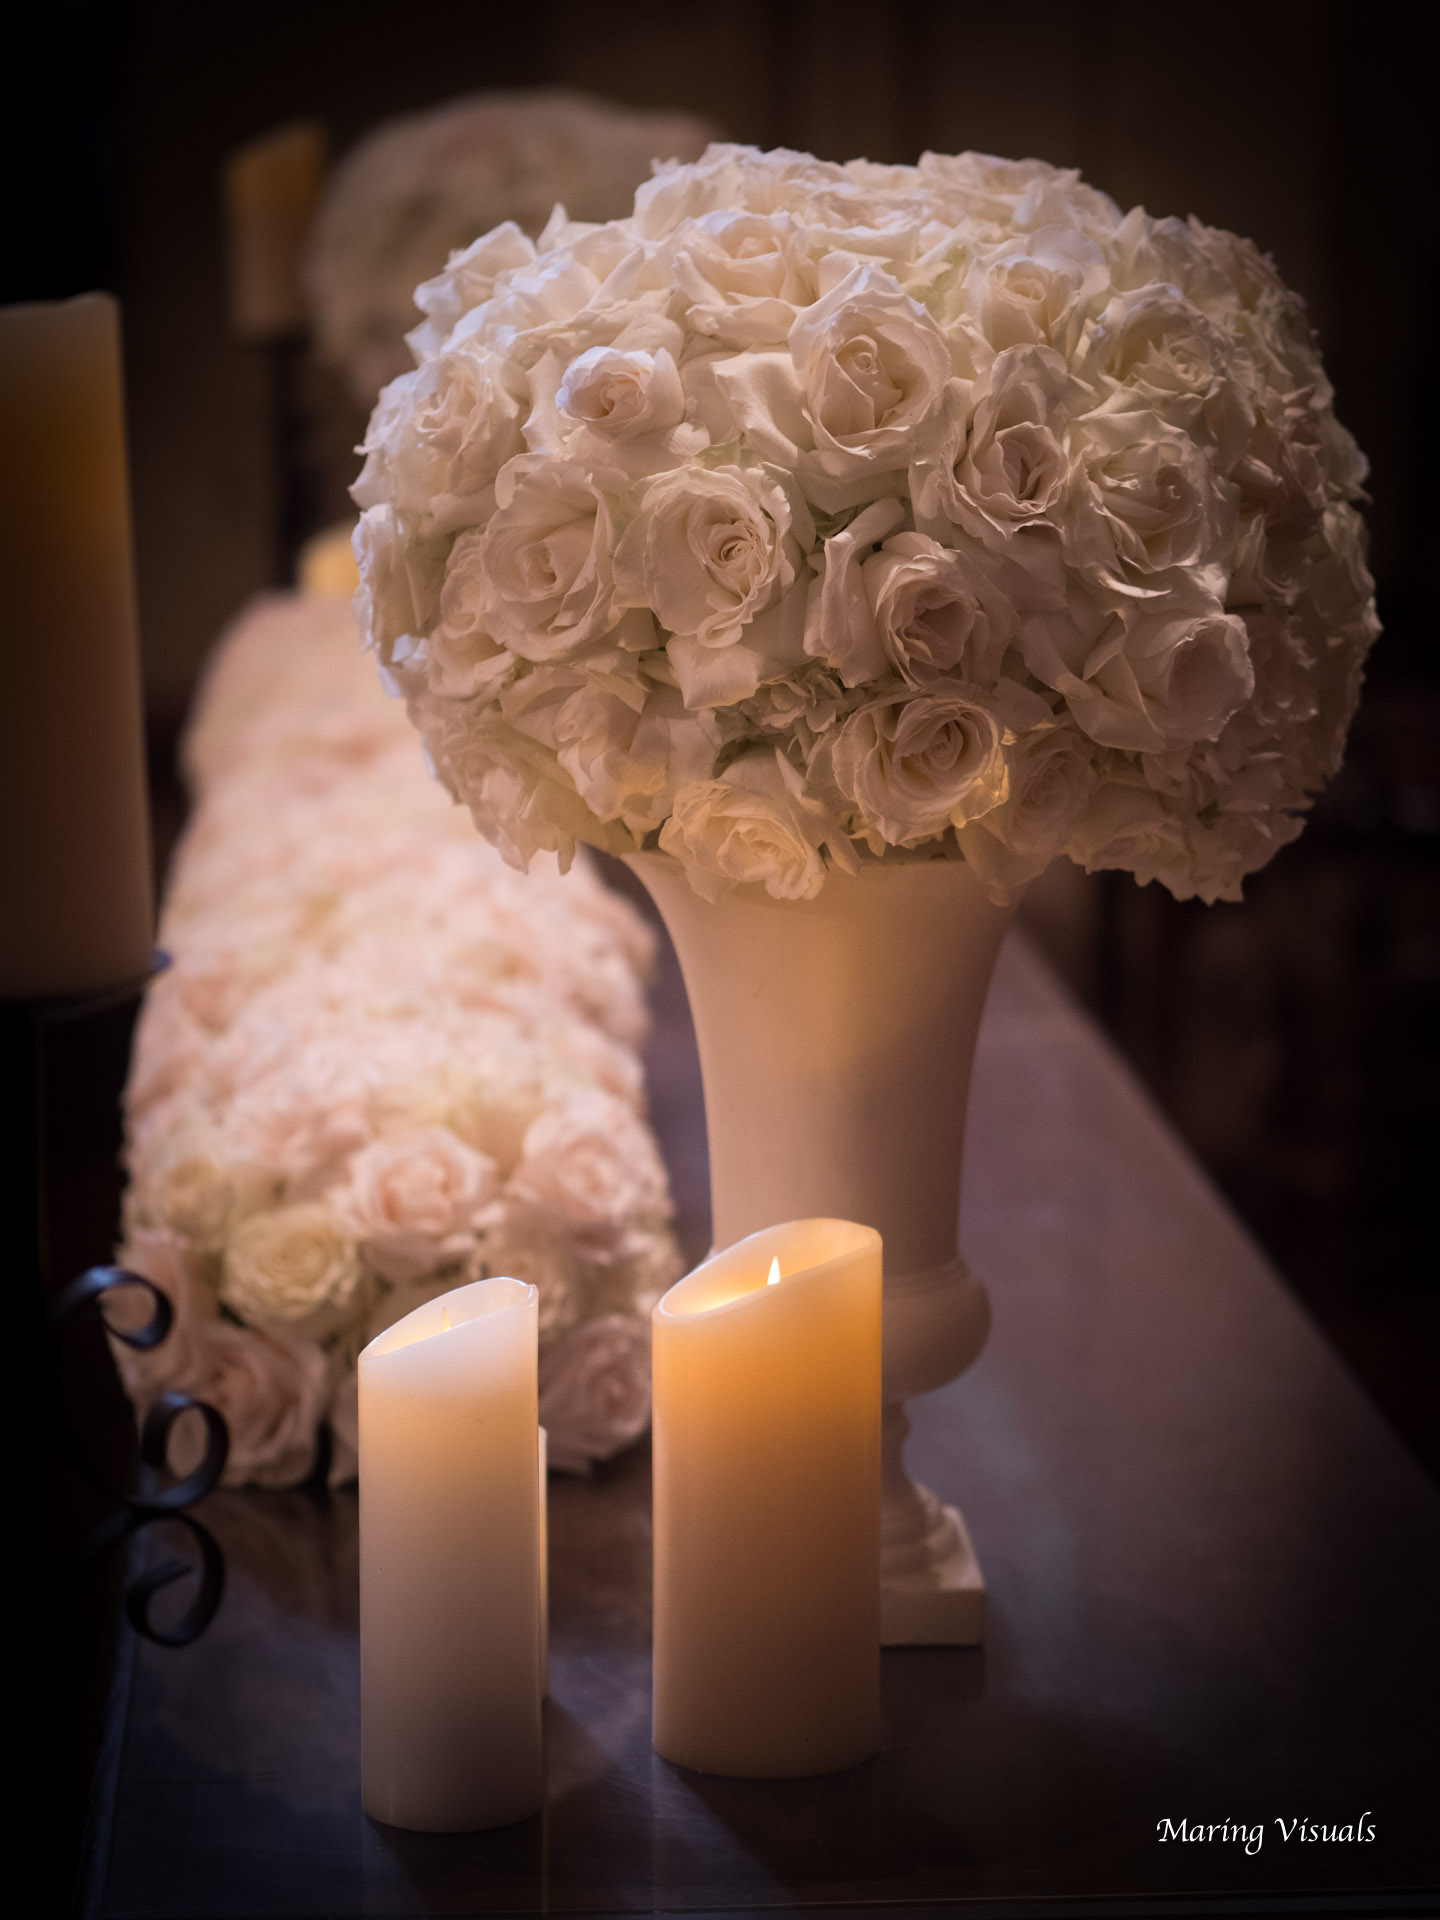 David Tutera Weddings by Maring Visuals 00515.jpg